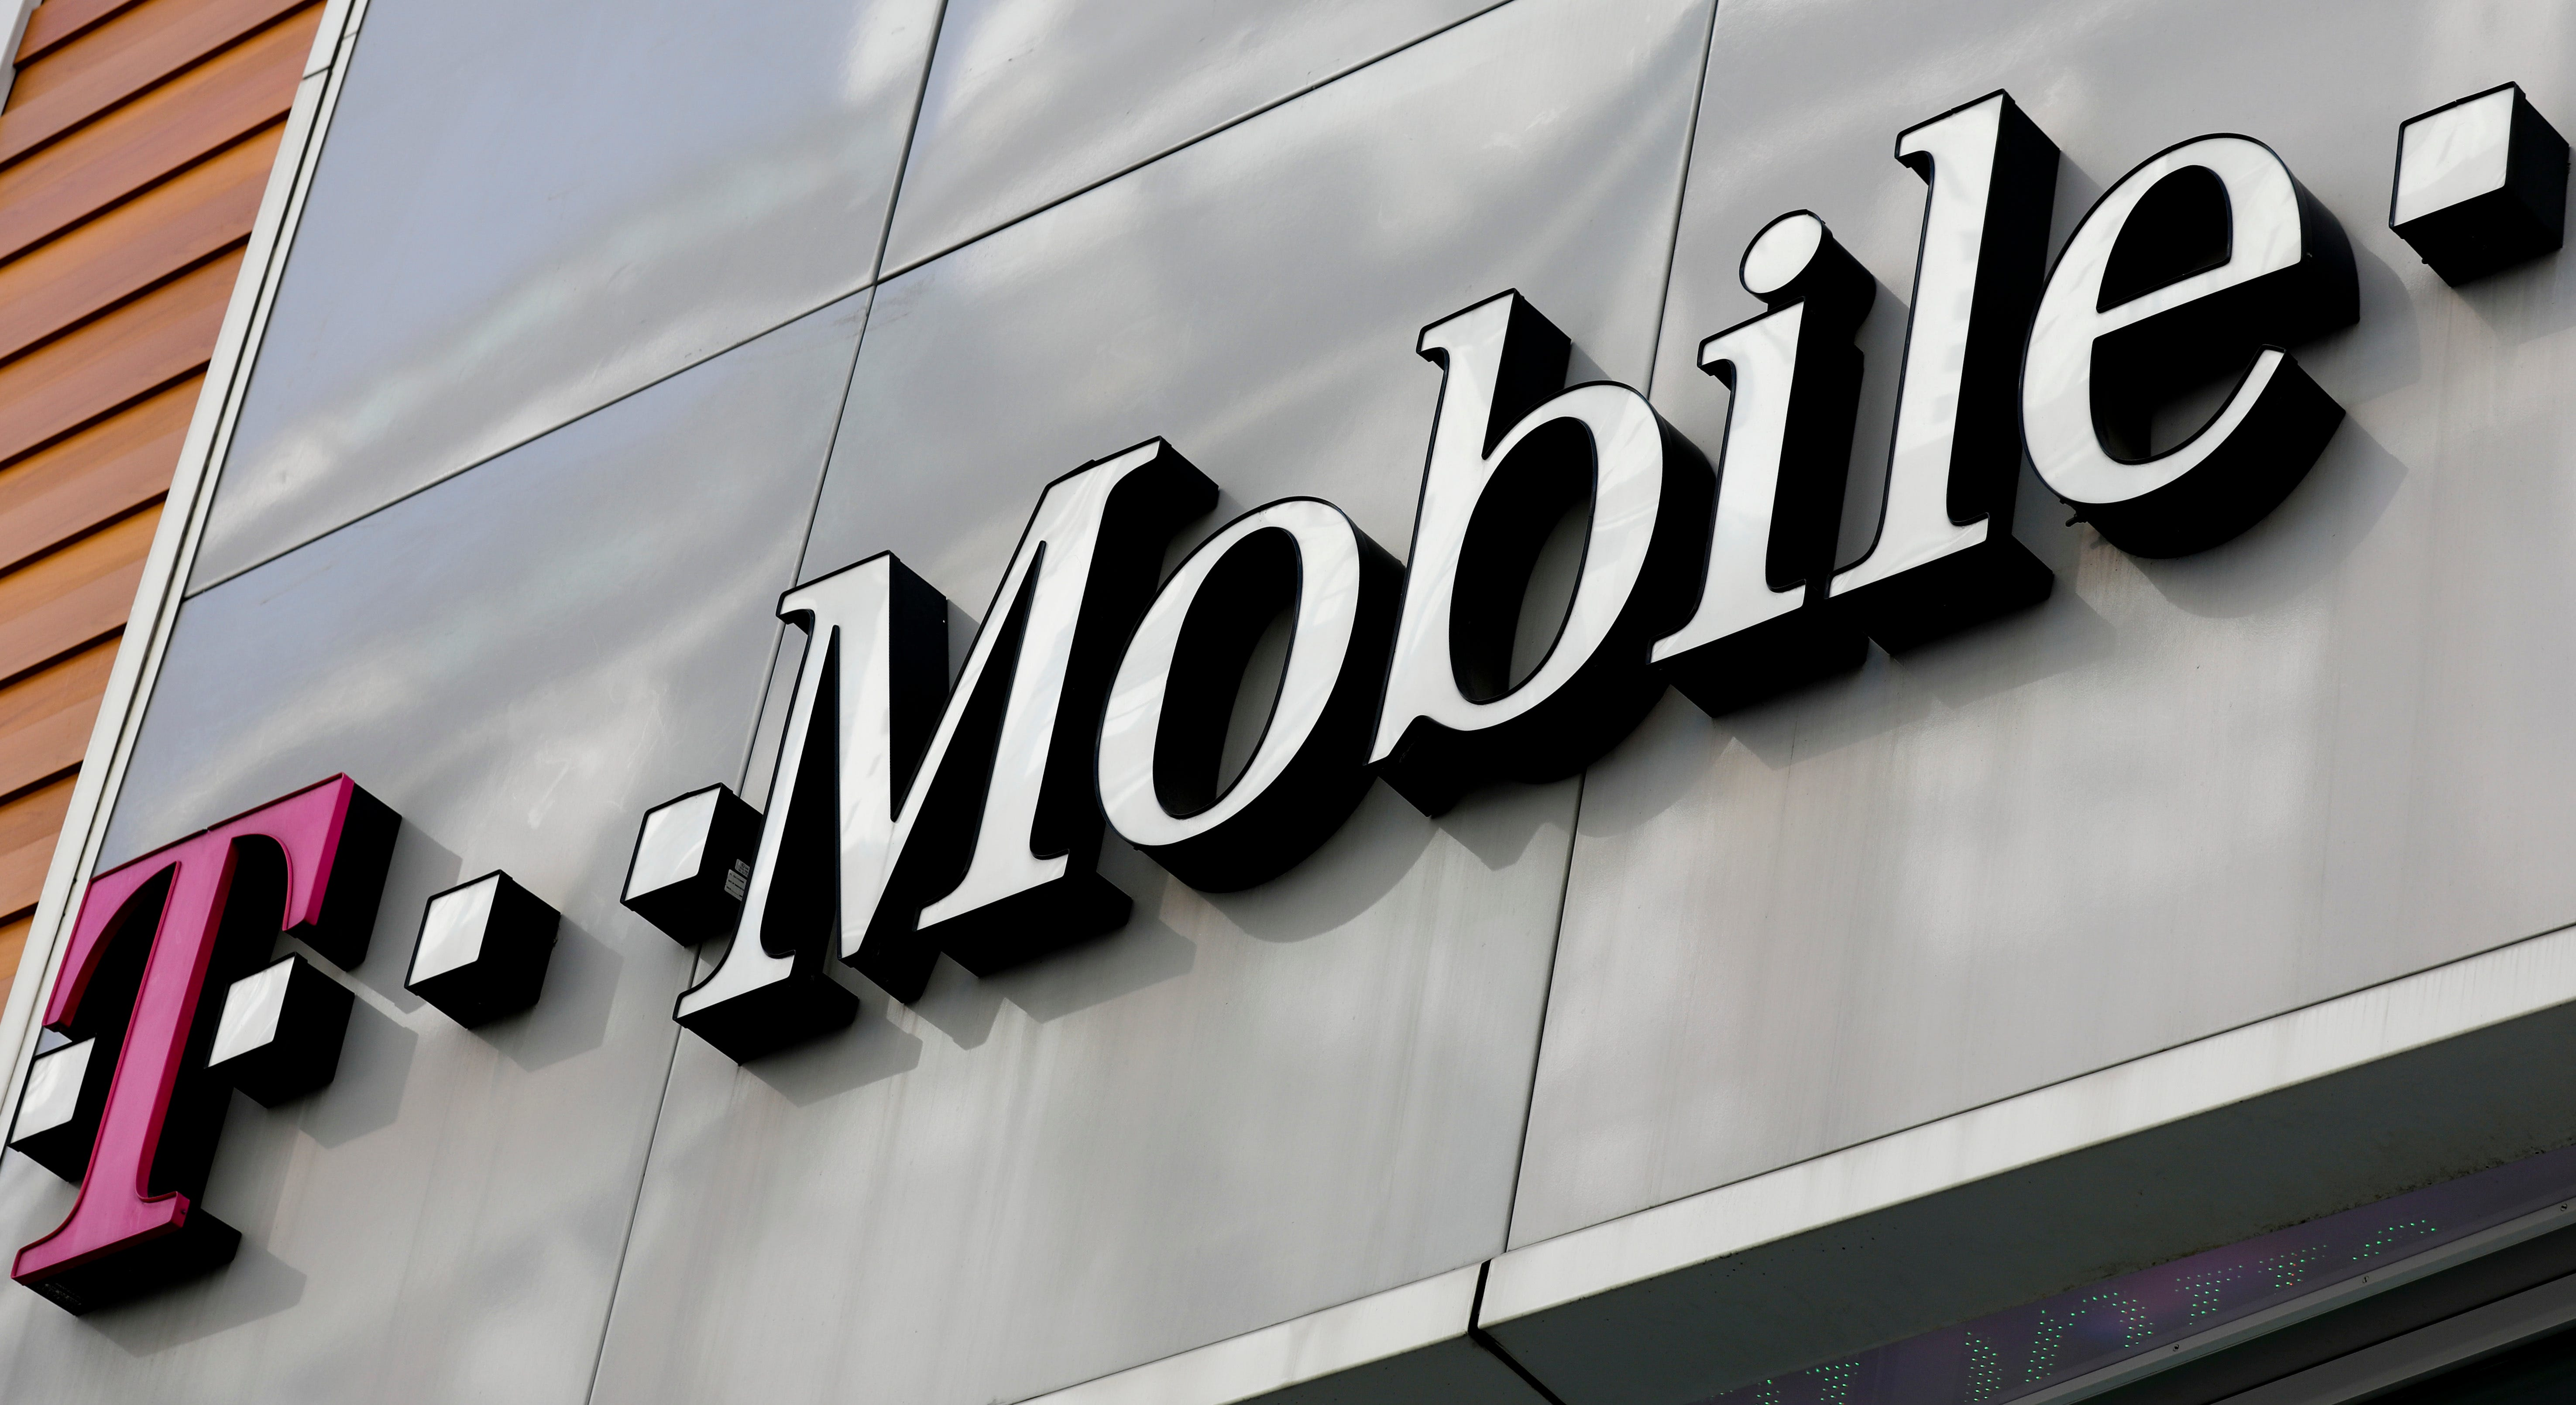 Federal appeals court revives cell carrier T-Mobile's lawsuit against Wilmington